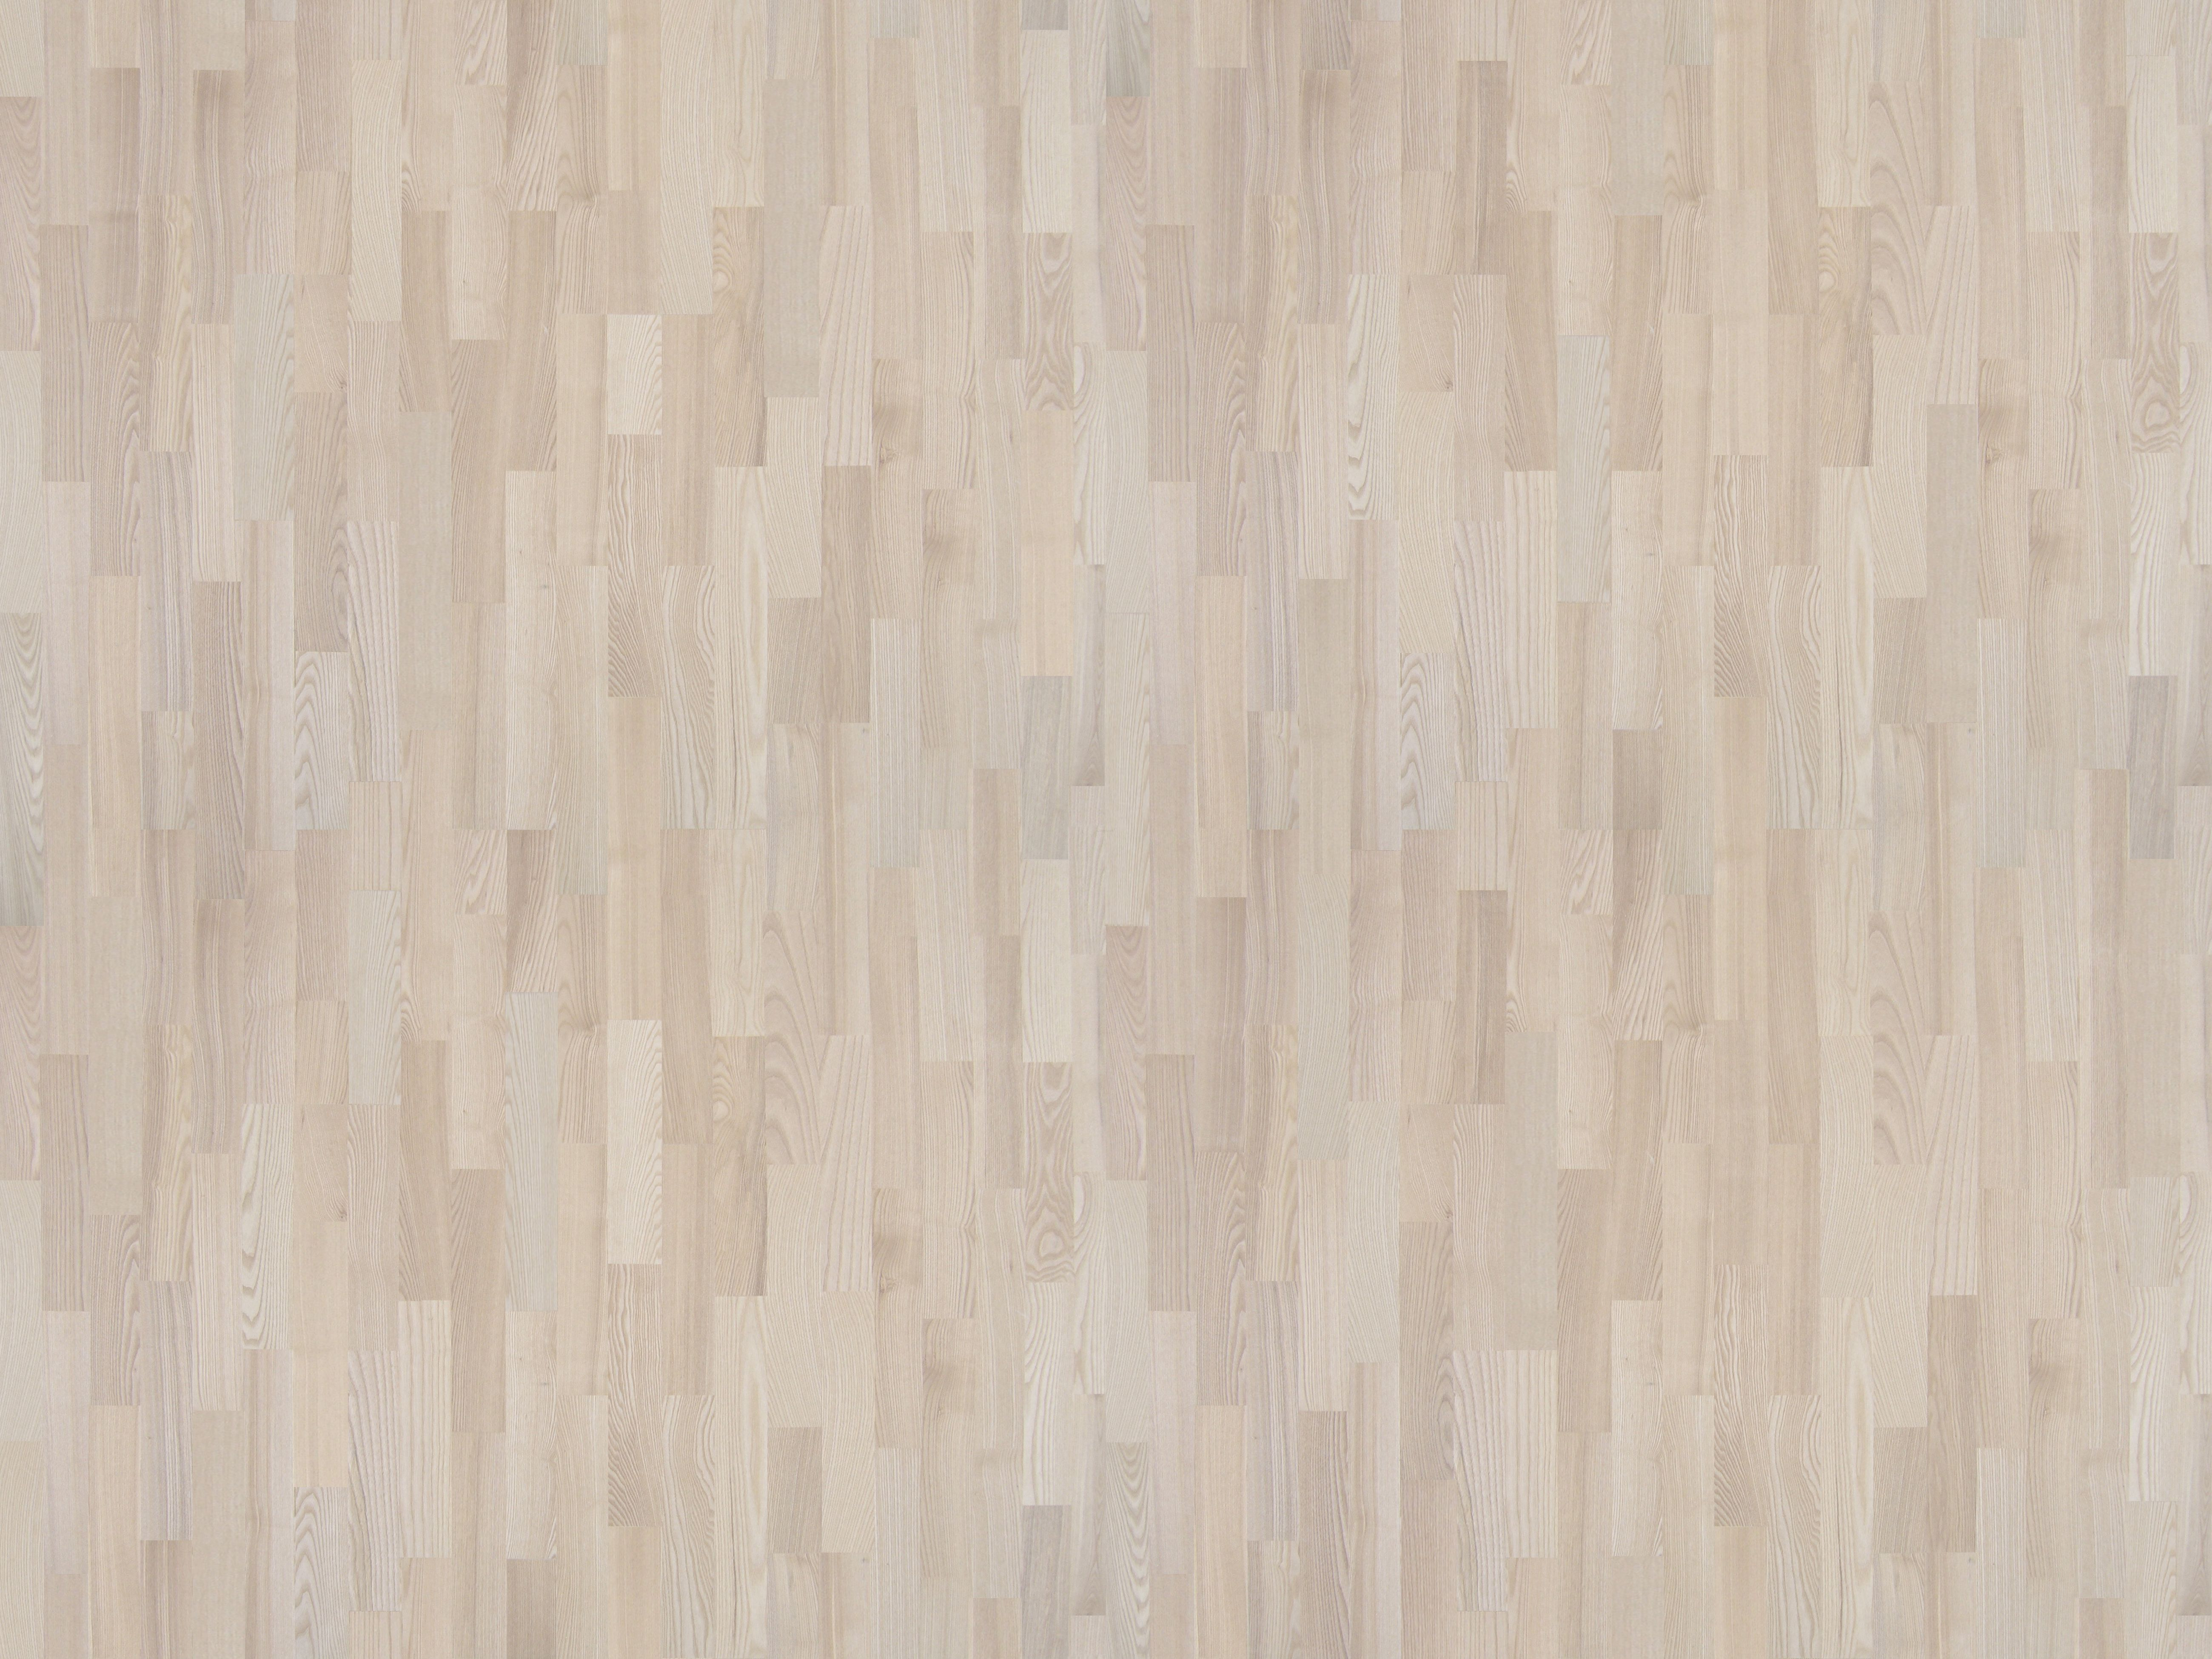 Light Wood Floor Texture Seamless Design Inspiration 210055 Floor Ideas Design Wood Floor Texture Parquet Texture Wood Floor Texture Seamless